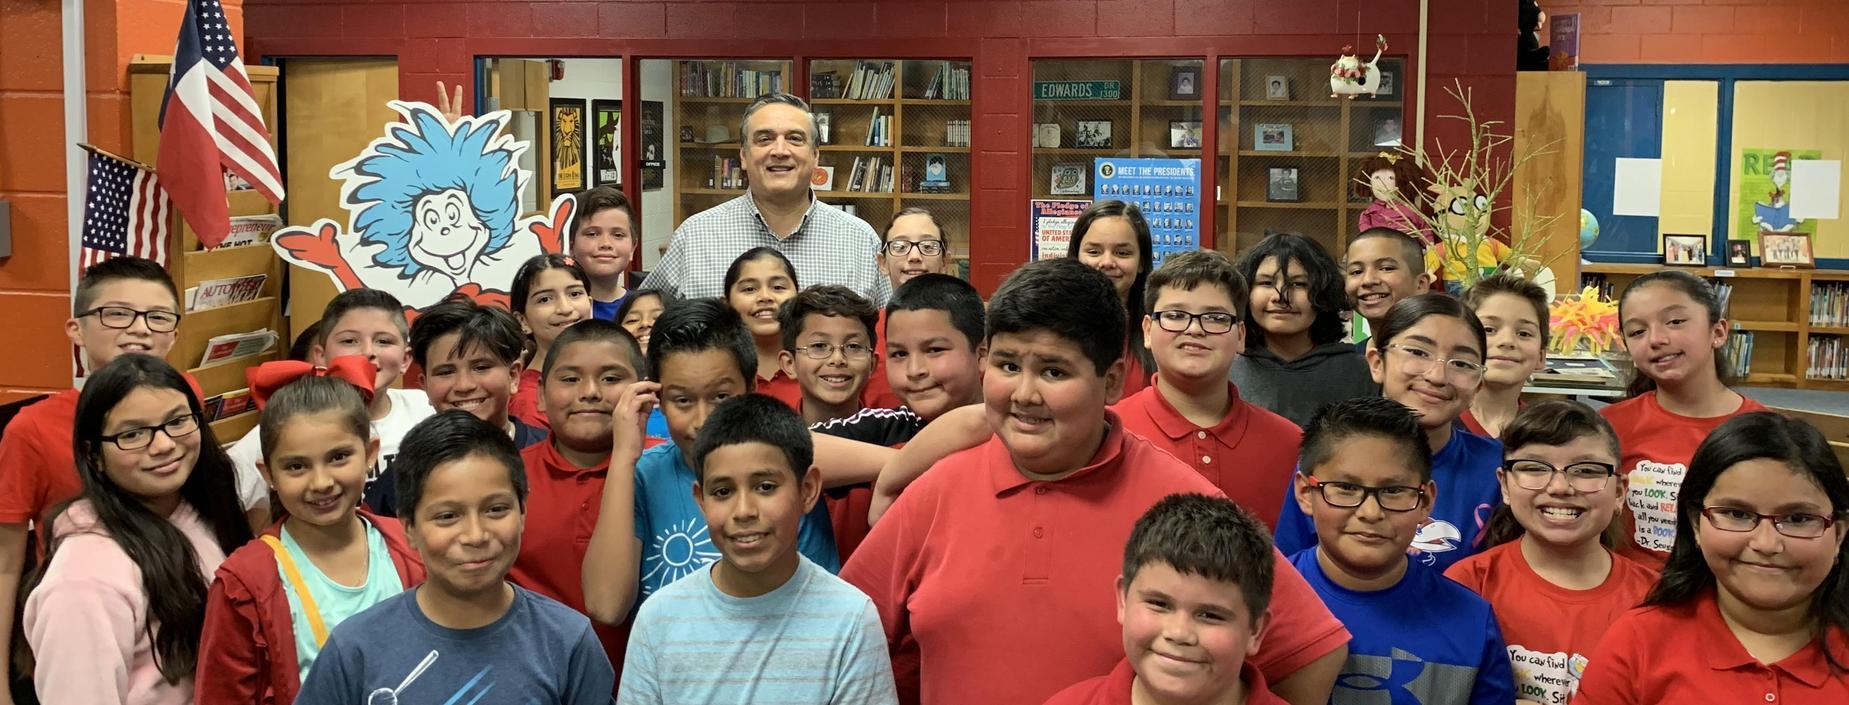 Dr. Jose Peralez III, DDS celebrates Read Across America